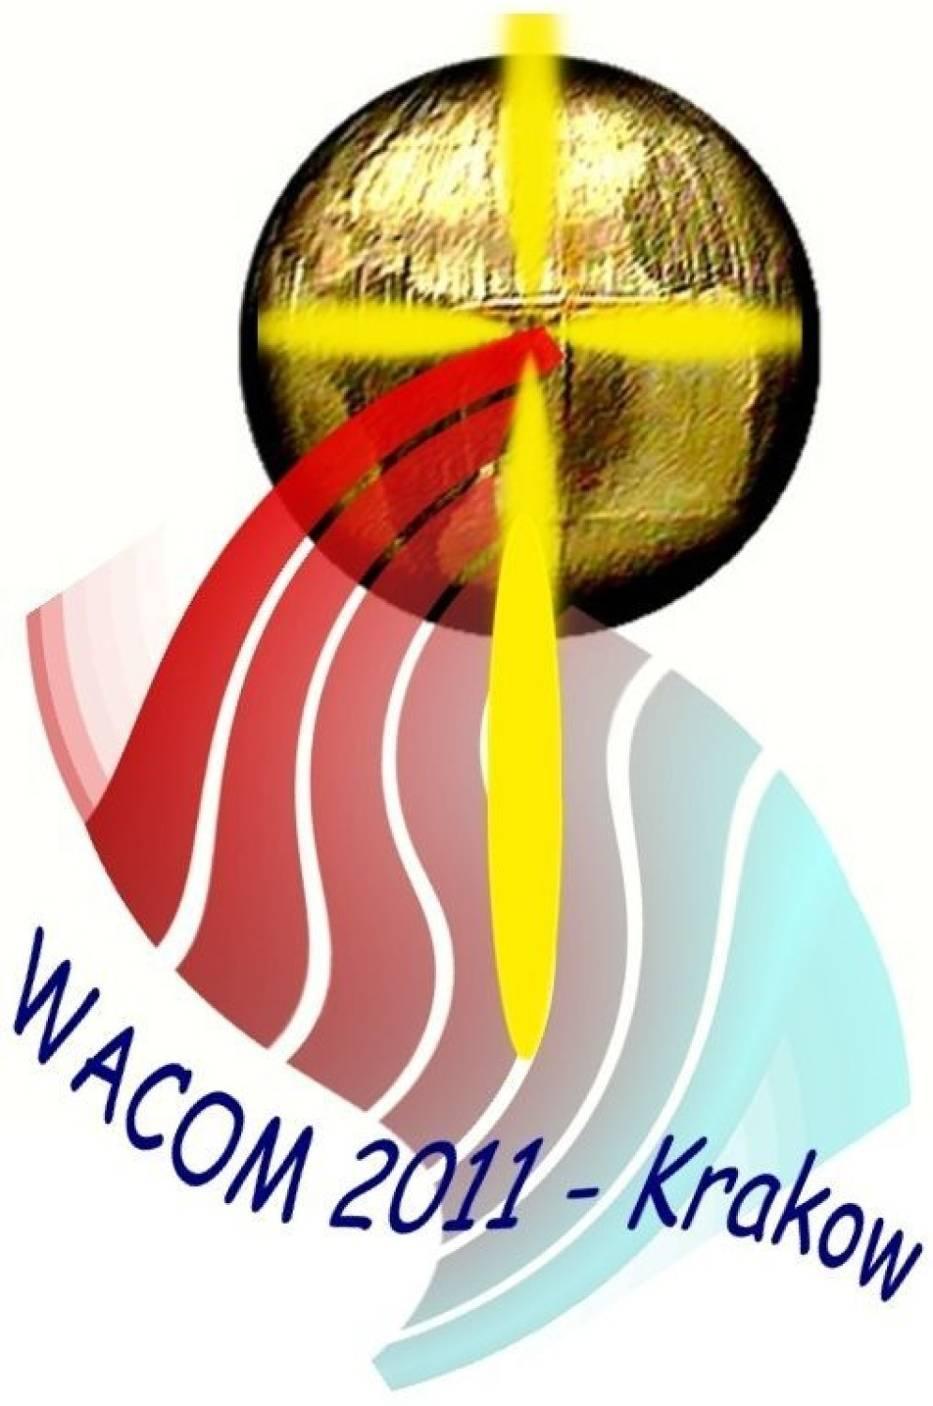 Oficjalne logo WACOM 2011